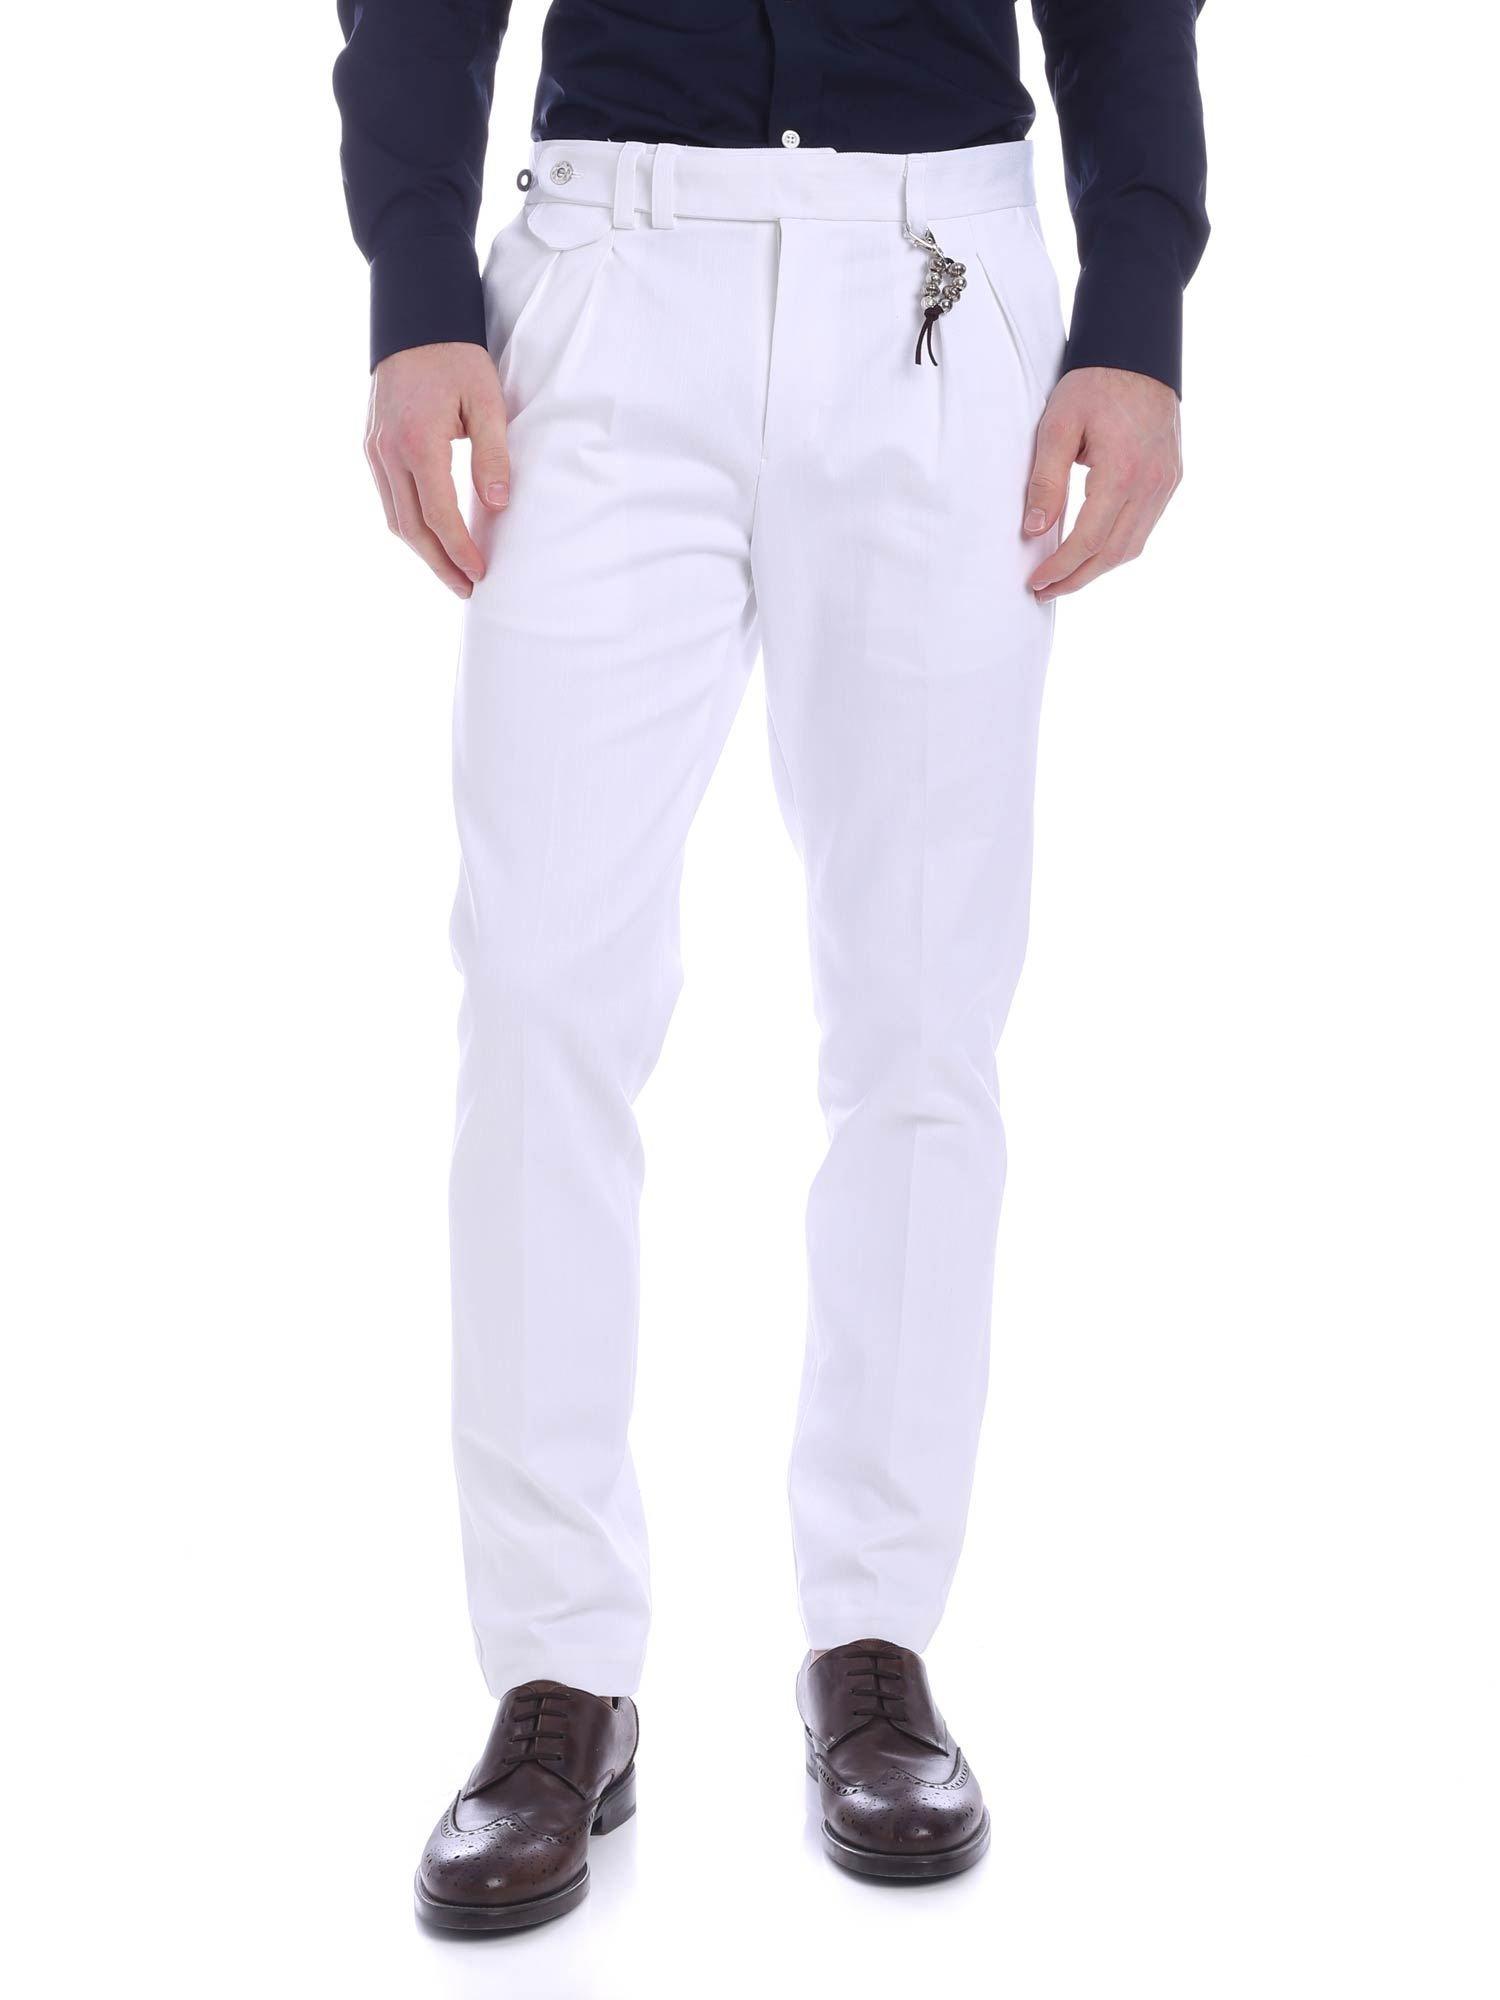 Image of Pantalone doppia pences denim bianco R96 D-B